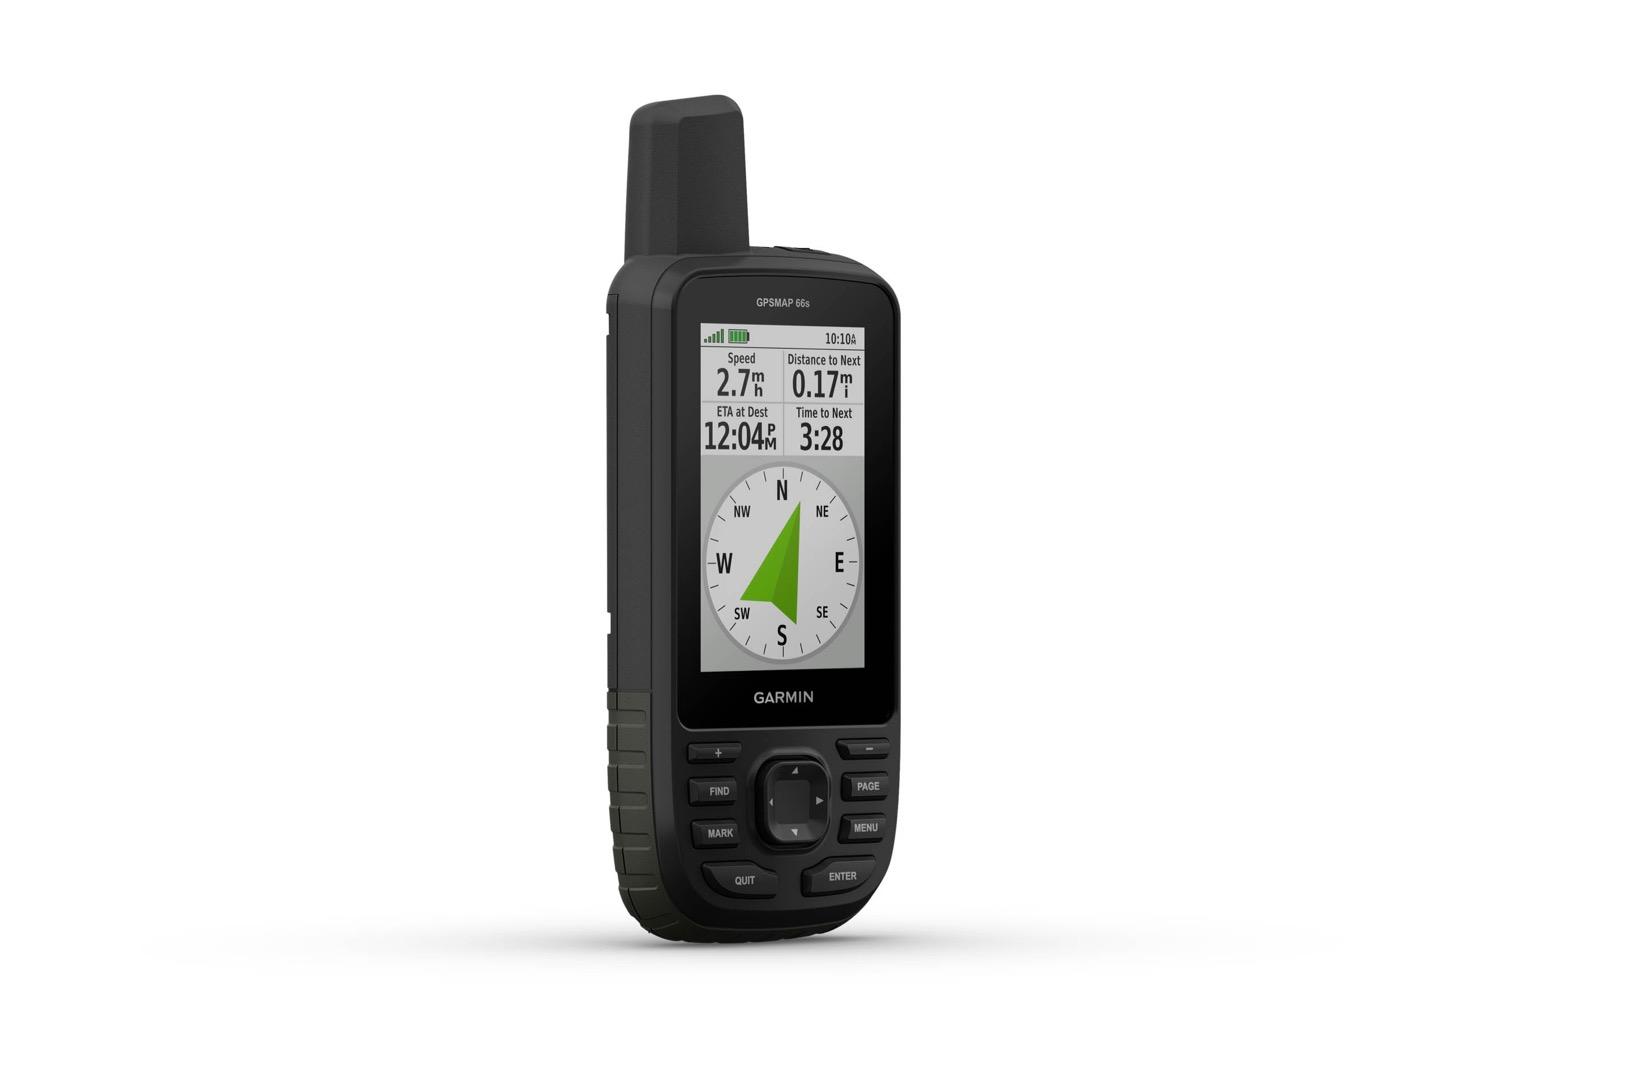 Il Garmin GPSMAP 66s